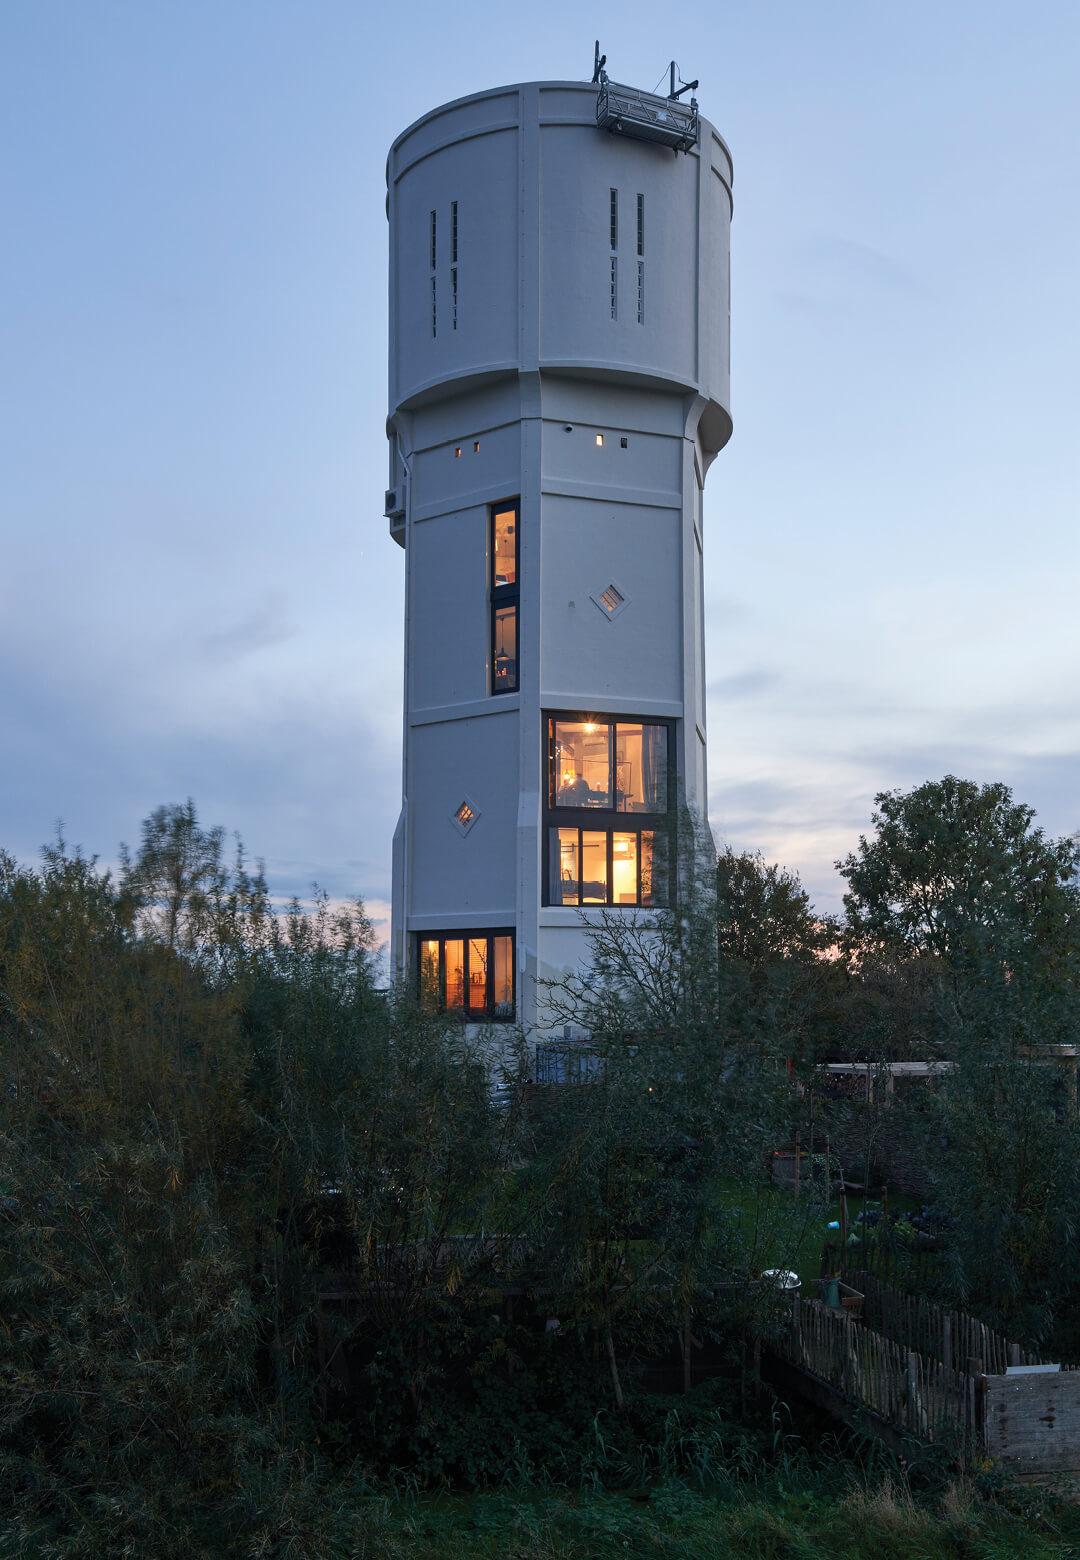 Winning project of the 2020 watertower prize | Transformation Watertower Nieuw Lekkerland | by RVArchitecture | STIRworld